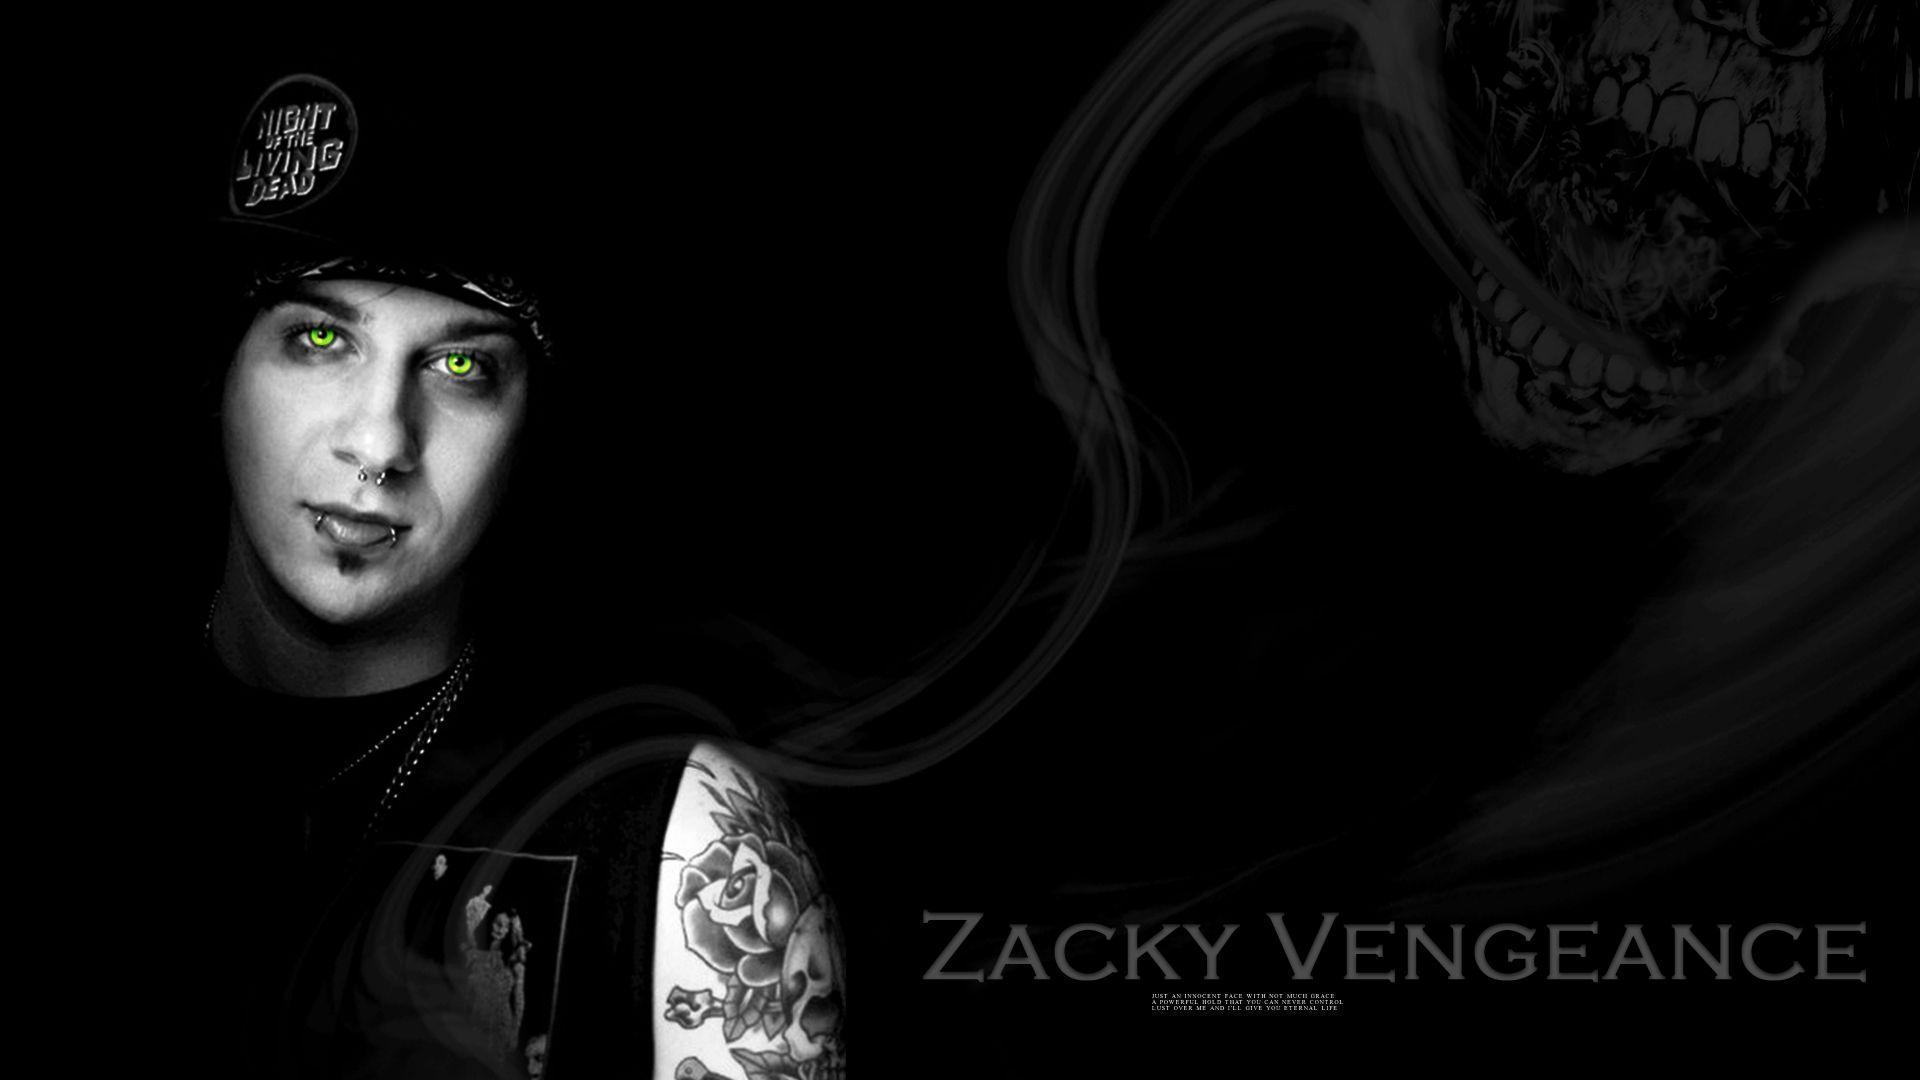 Zacky Vengeance Wallpapers Wallpaper Cave